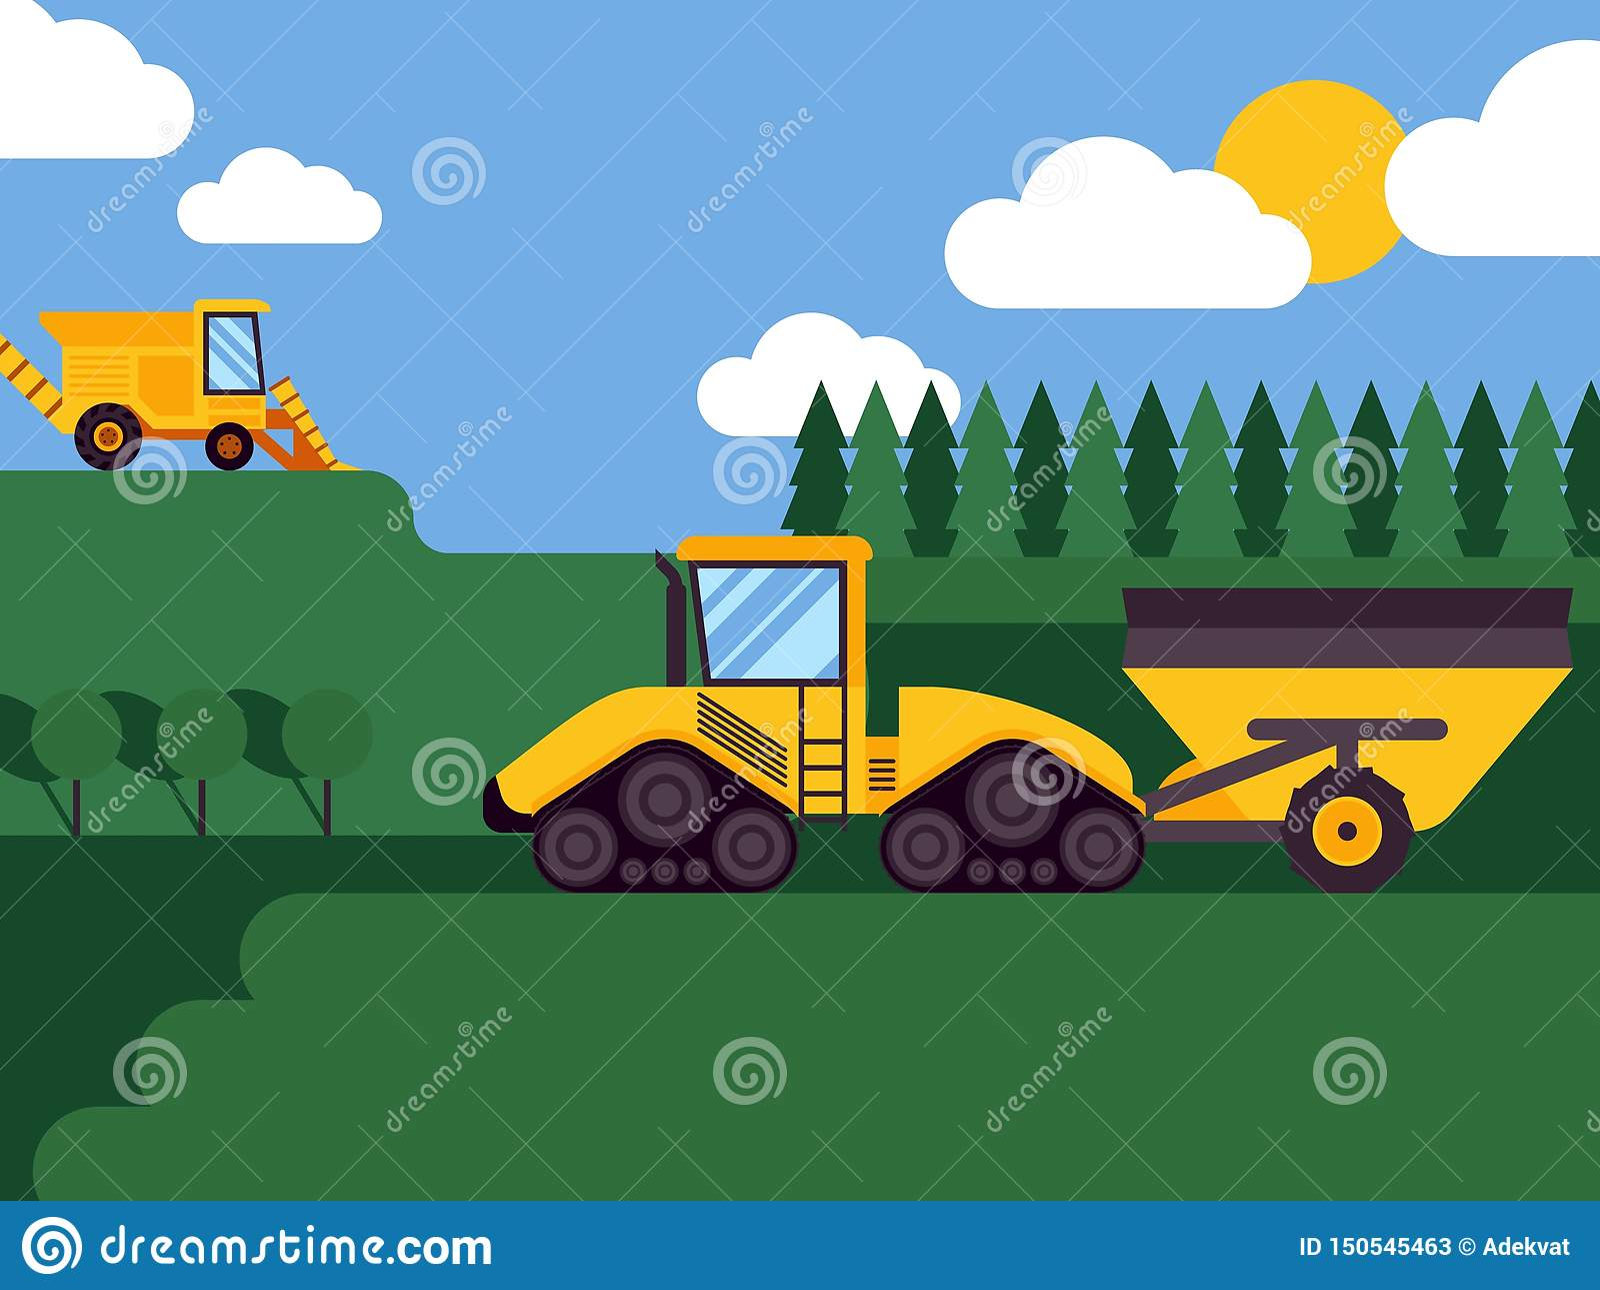 Agricultural combine harvester seasonal farming landscape scene illustration background vector. Fields and forests